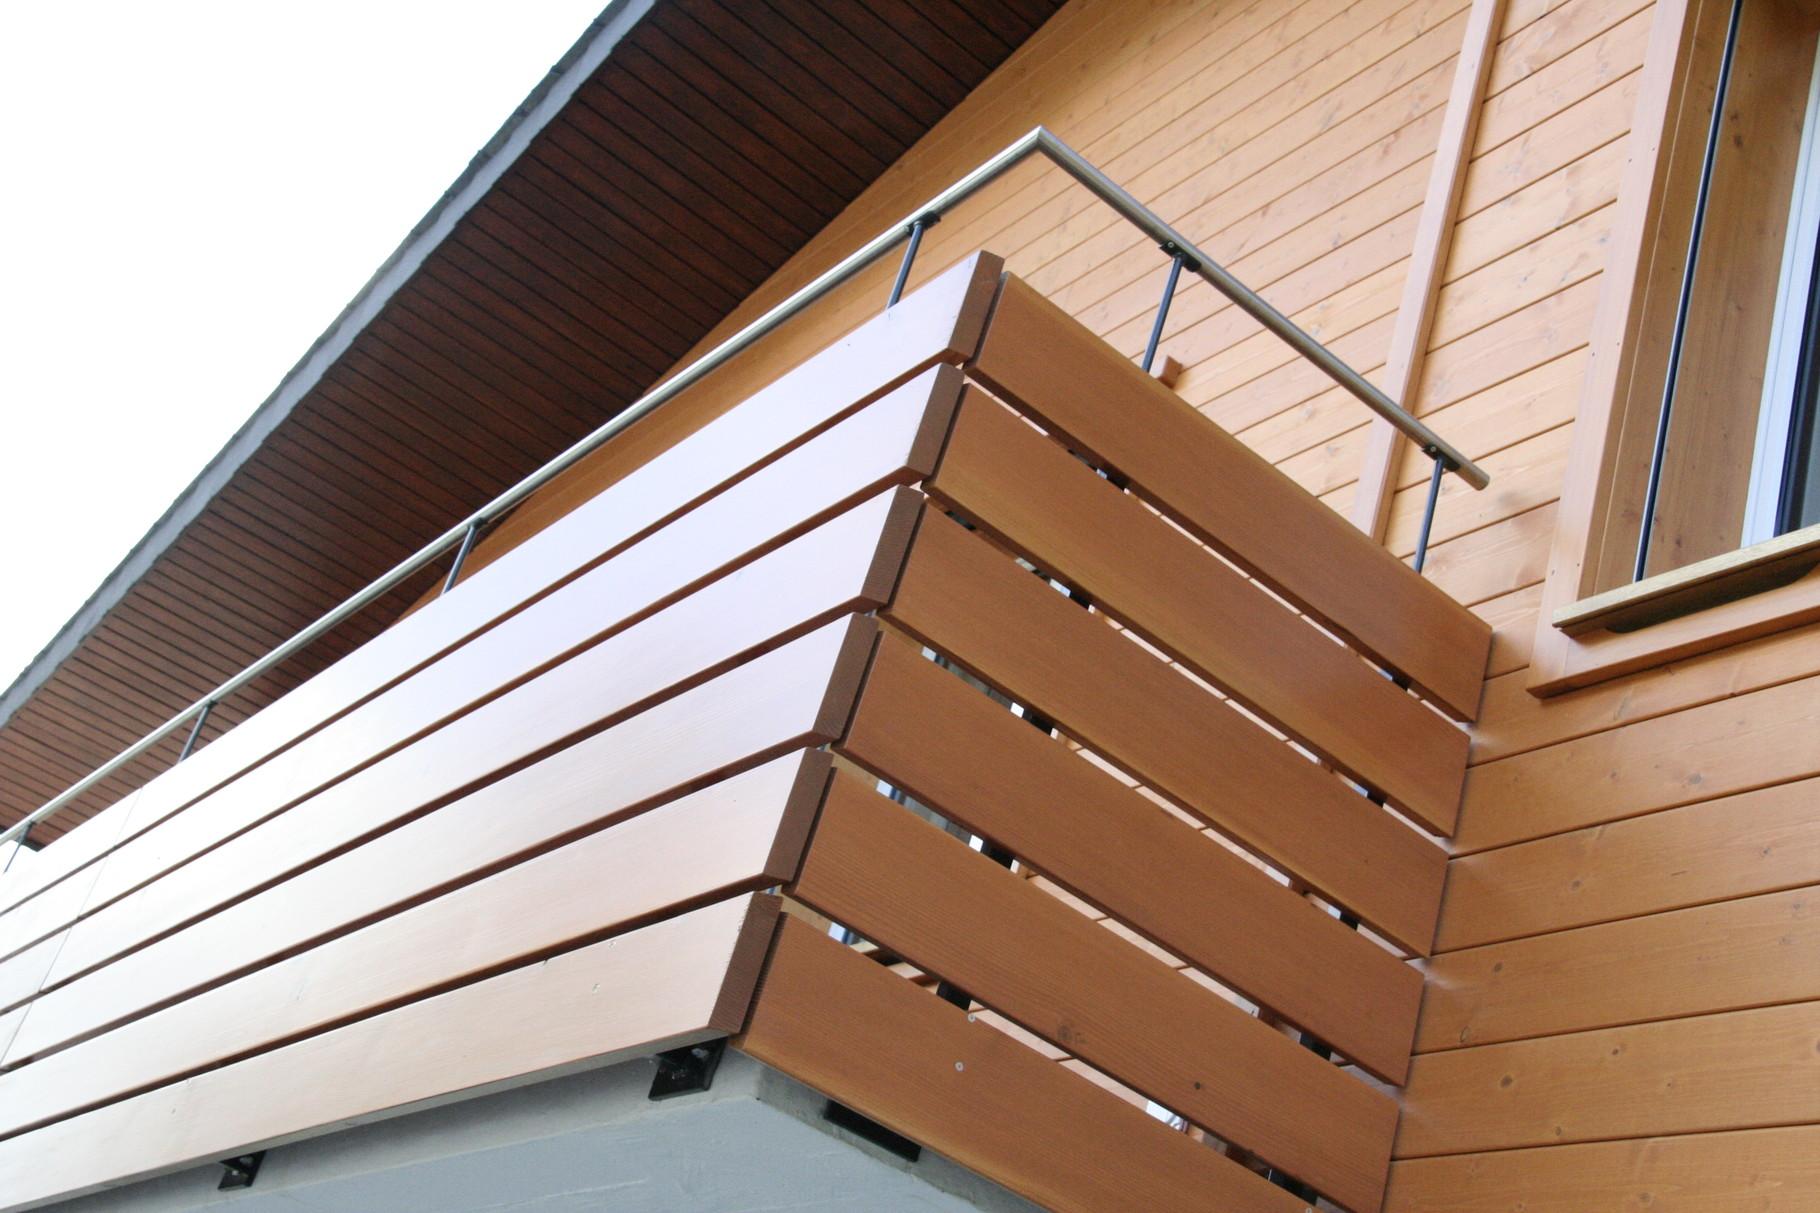 holzfassaden balkongel nder felder handwerk design. Black Bedroom Furniture Sets. Home Design Ideas